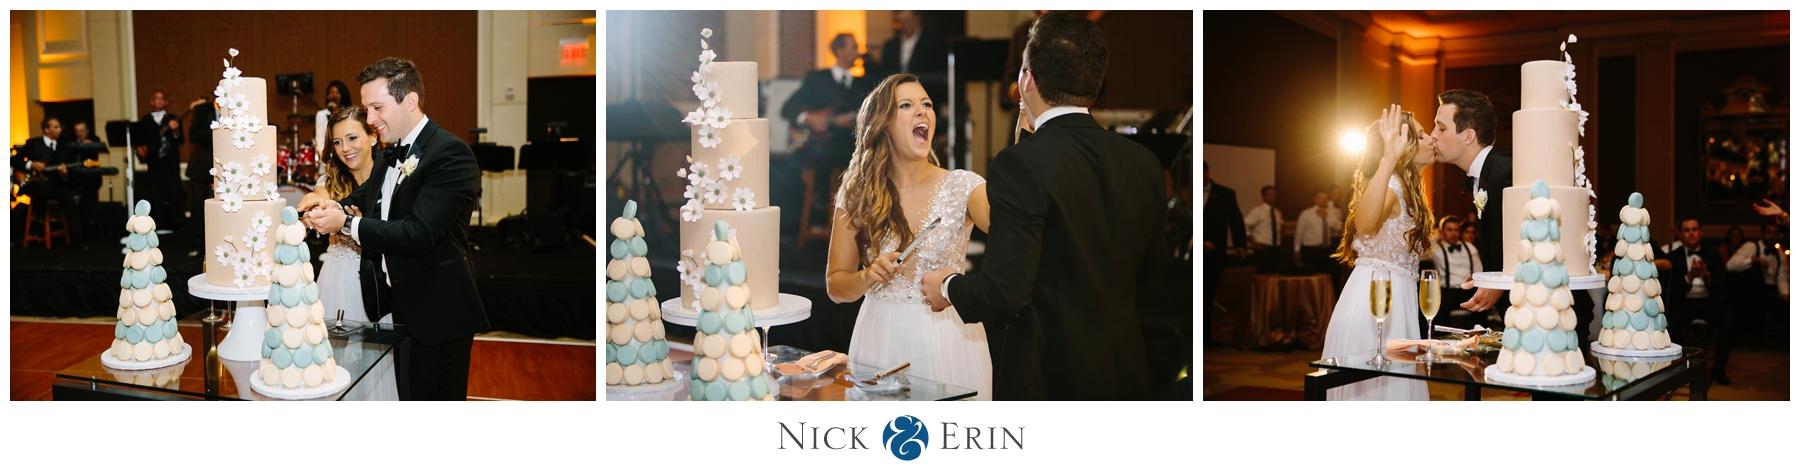 donner_photography_washington-dc-wedding_ariel-patrick_0076